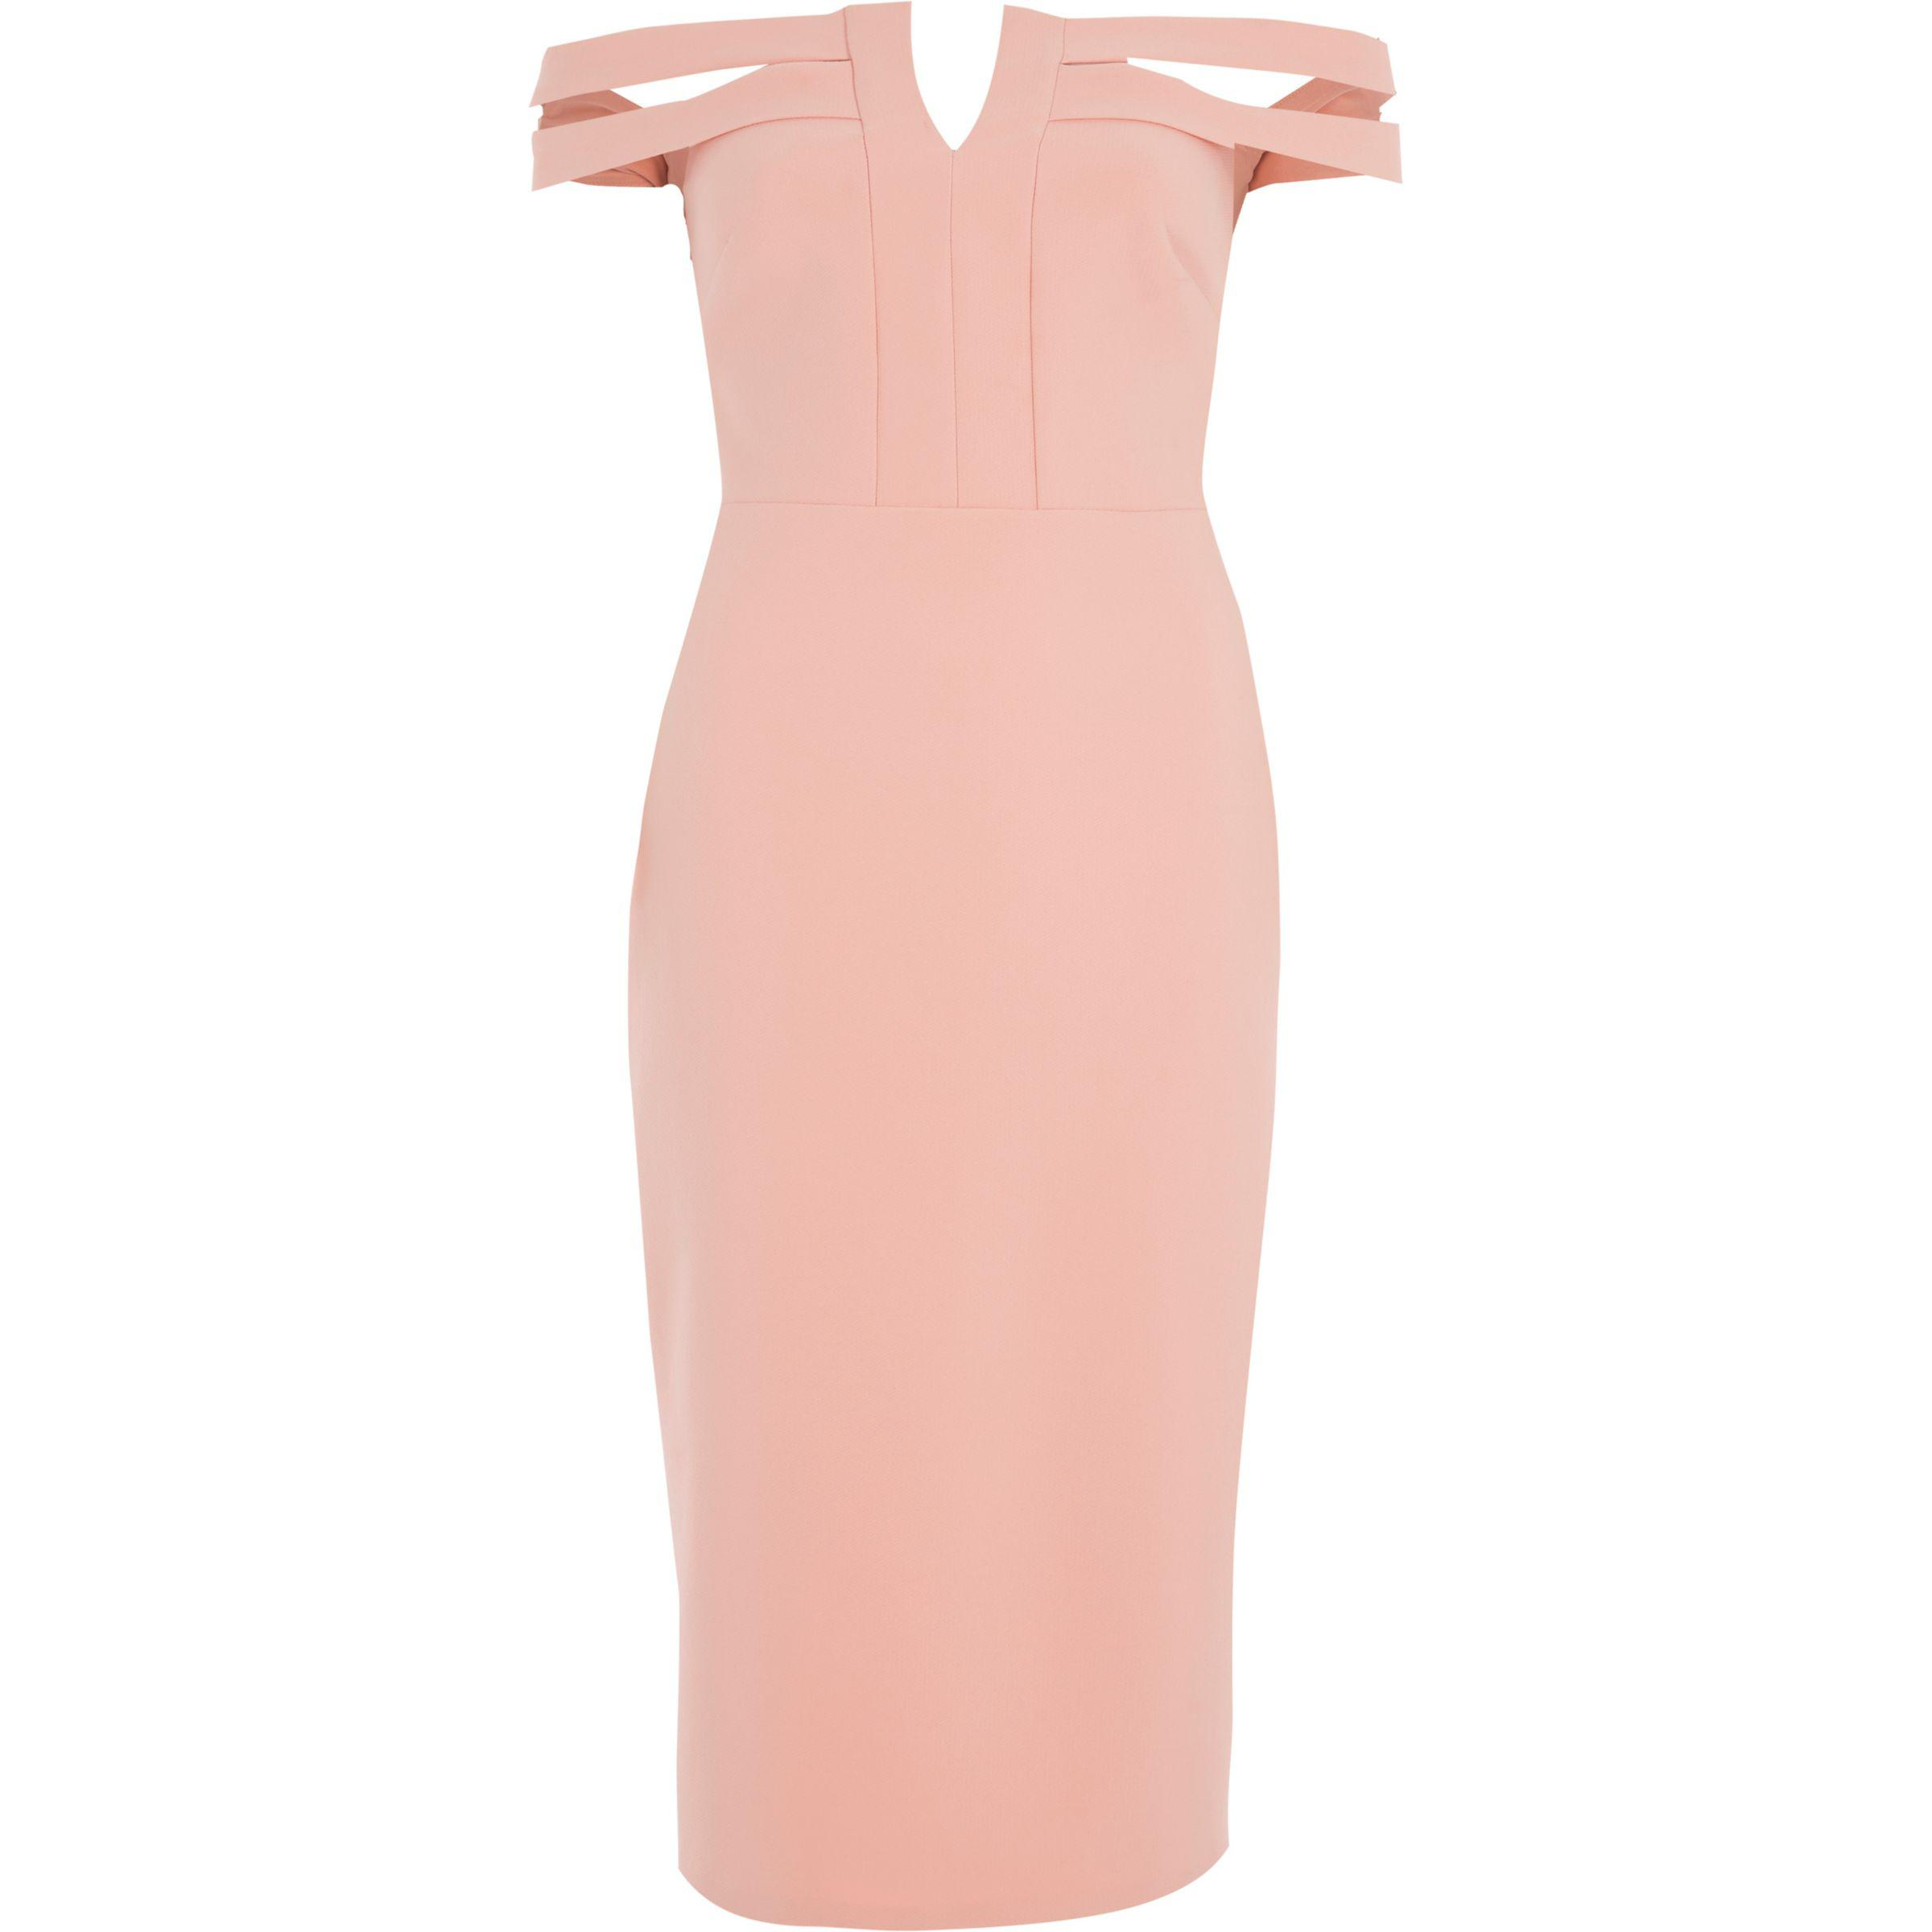 Hop silver island river dress bright pink midi bodycon online